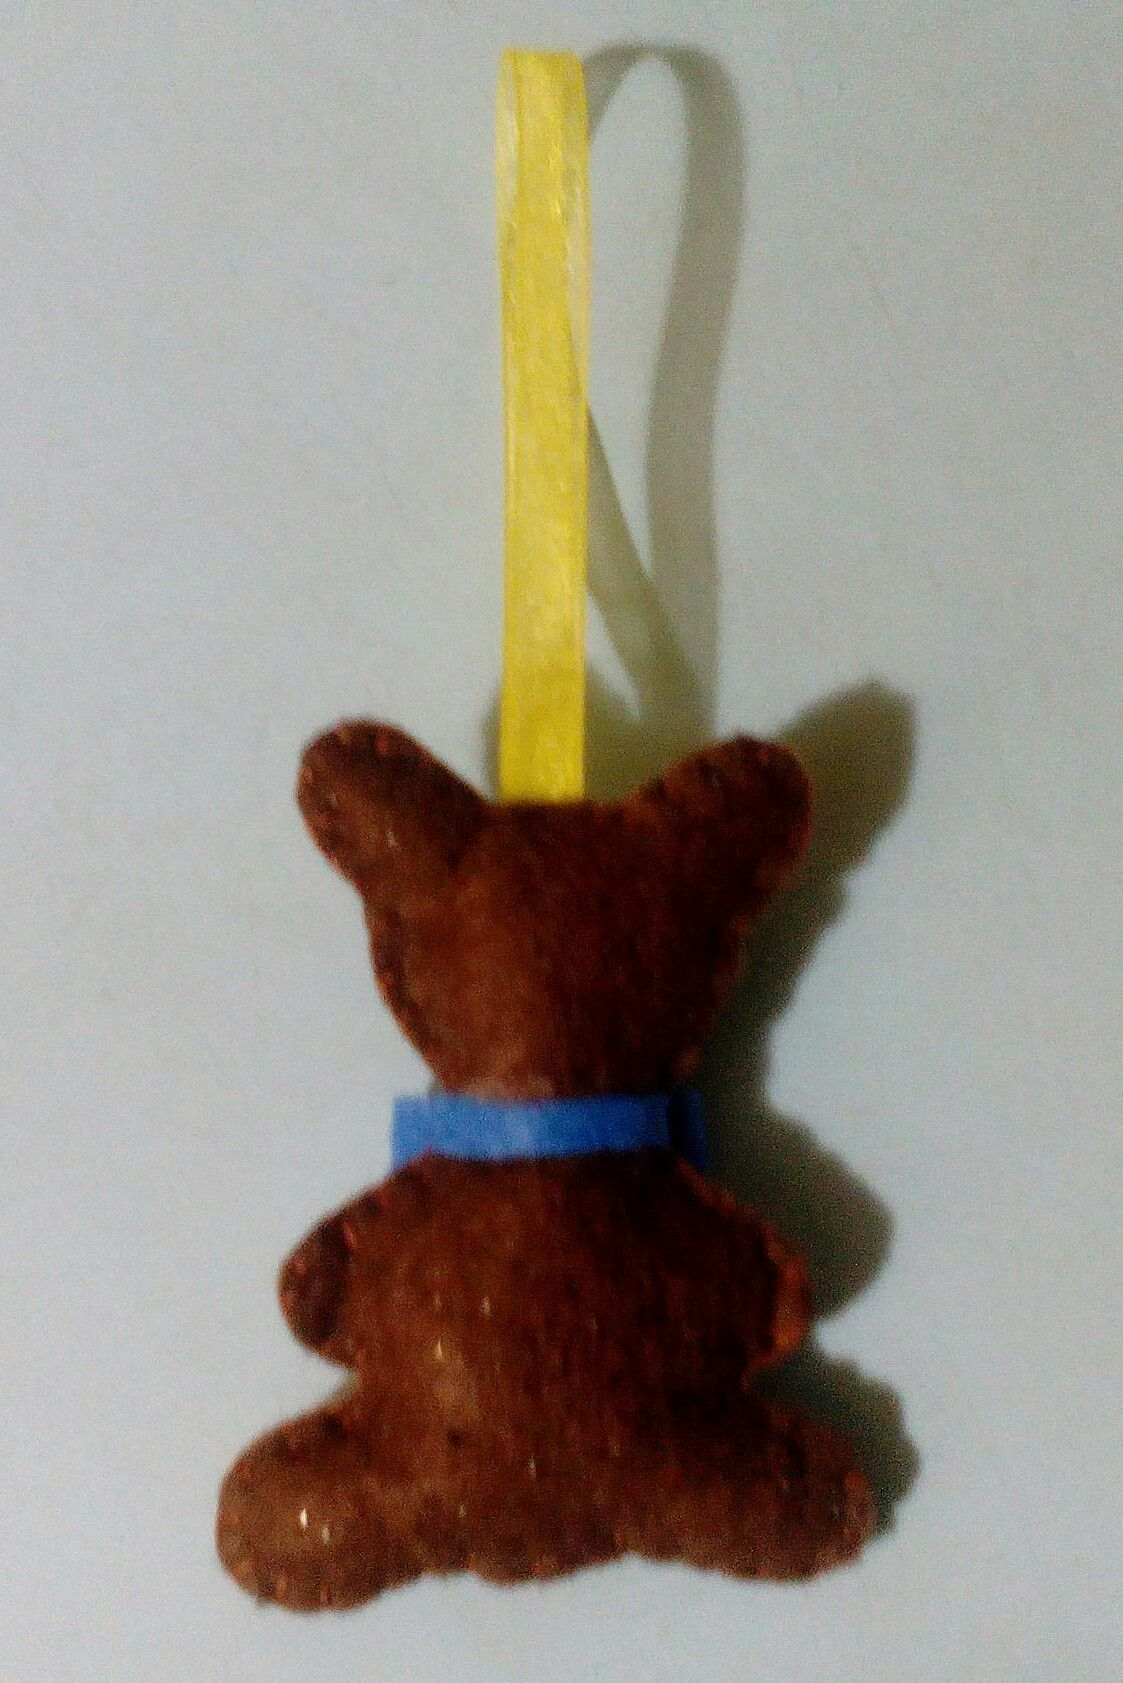 лента медвежонок синтепон нитки мулине фетр подарок